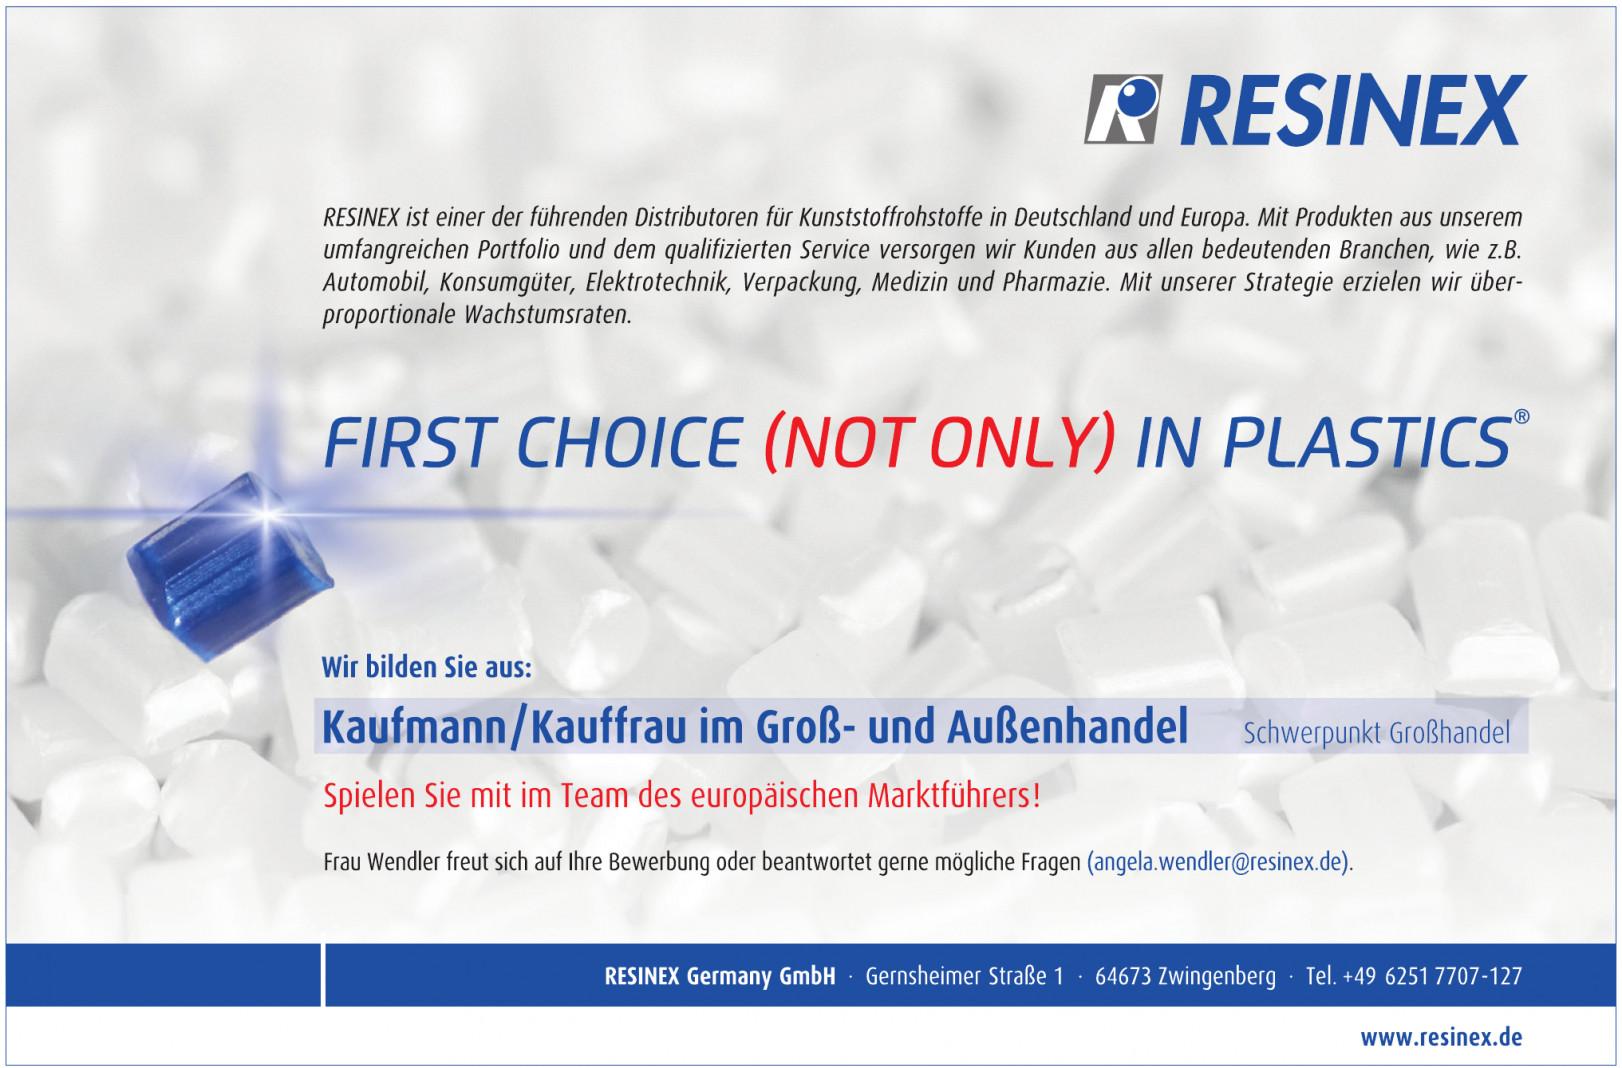 Resinex Germany Gmbh